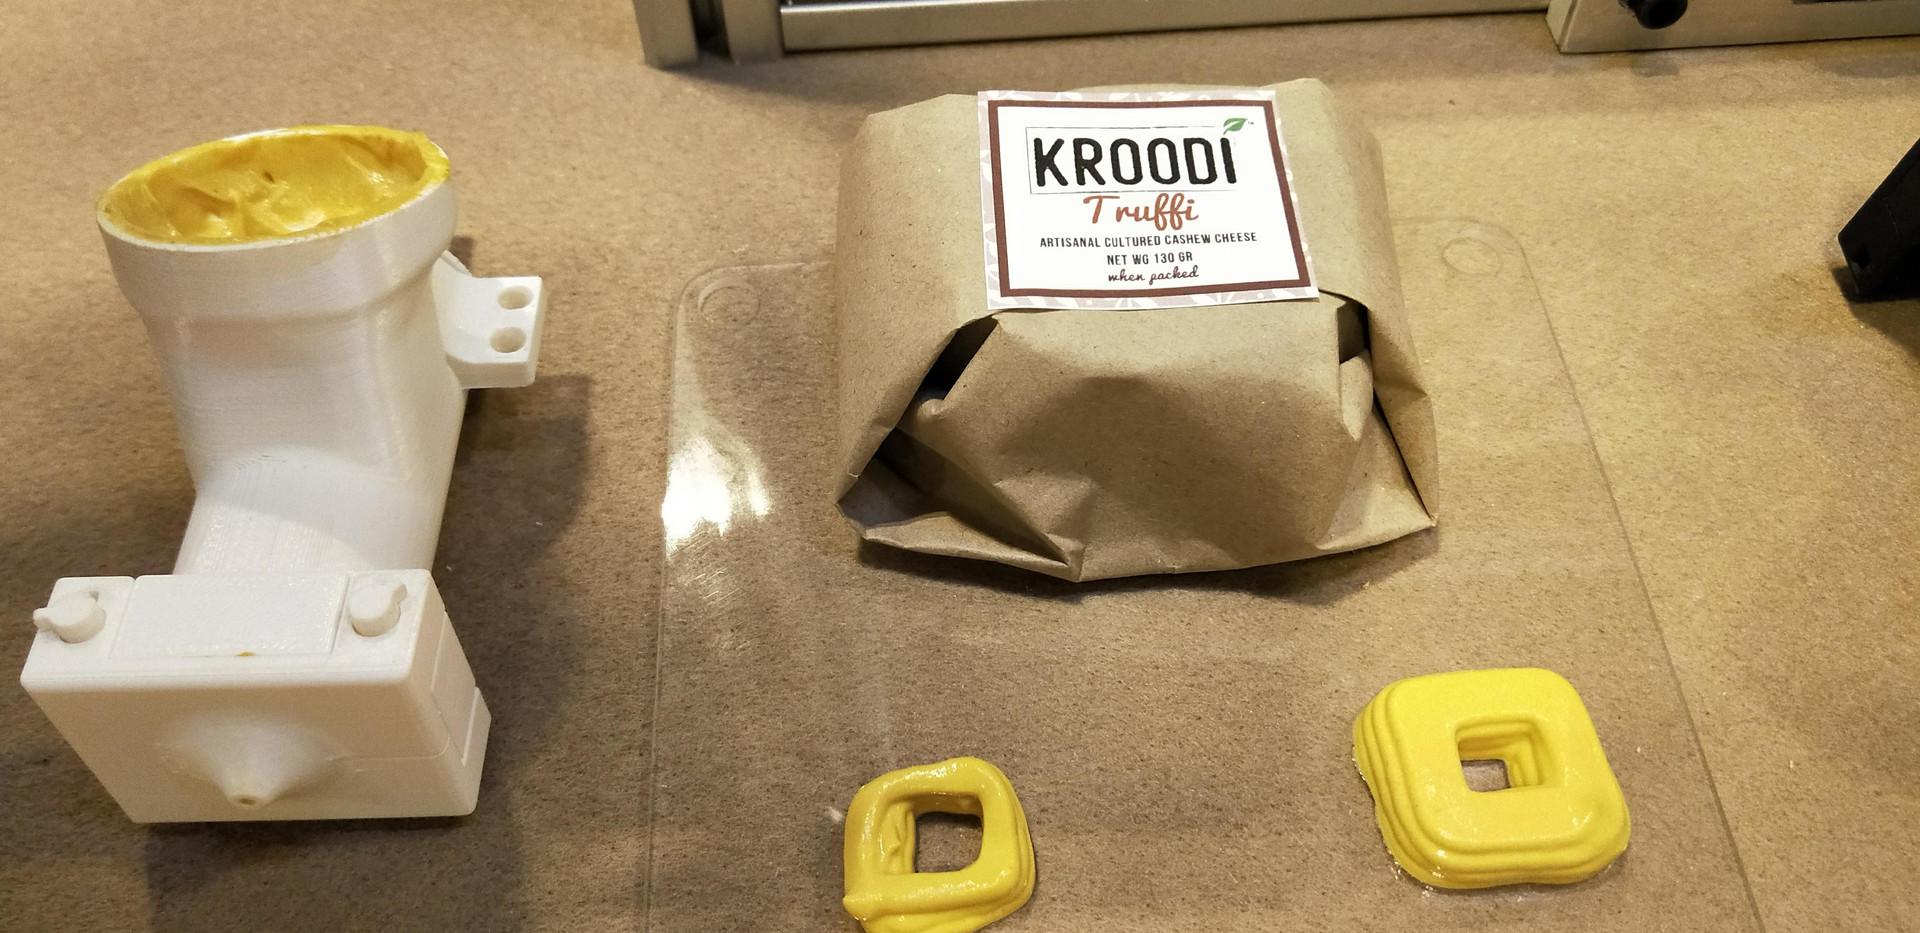 Kroodi Cheese 3D printed as squares